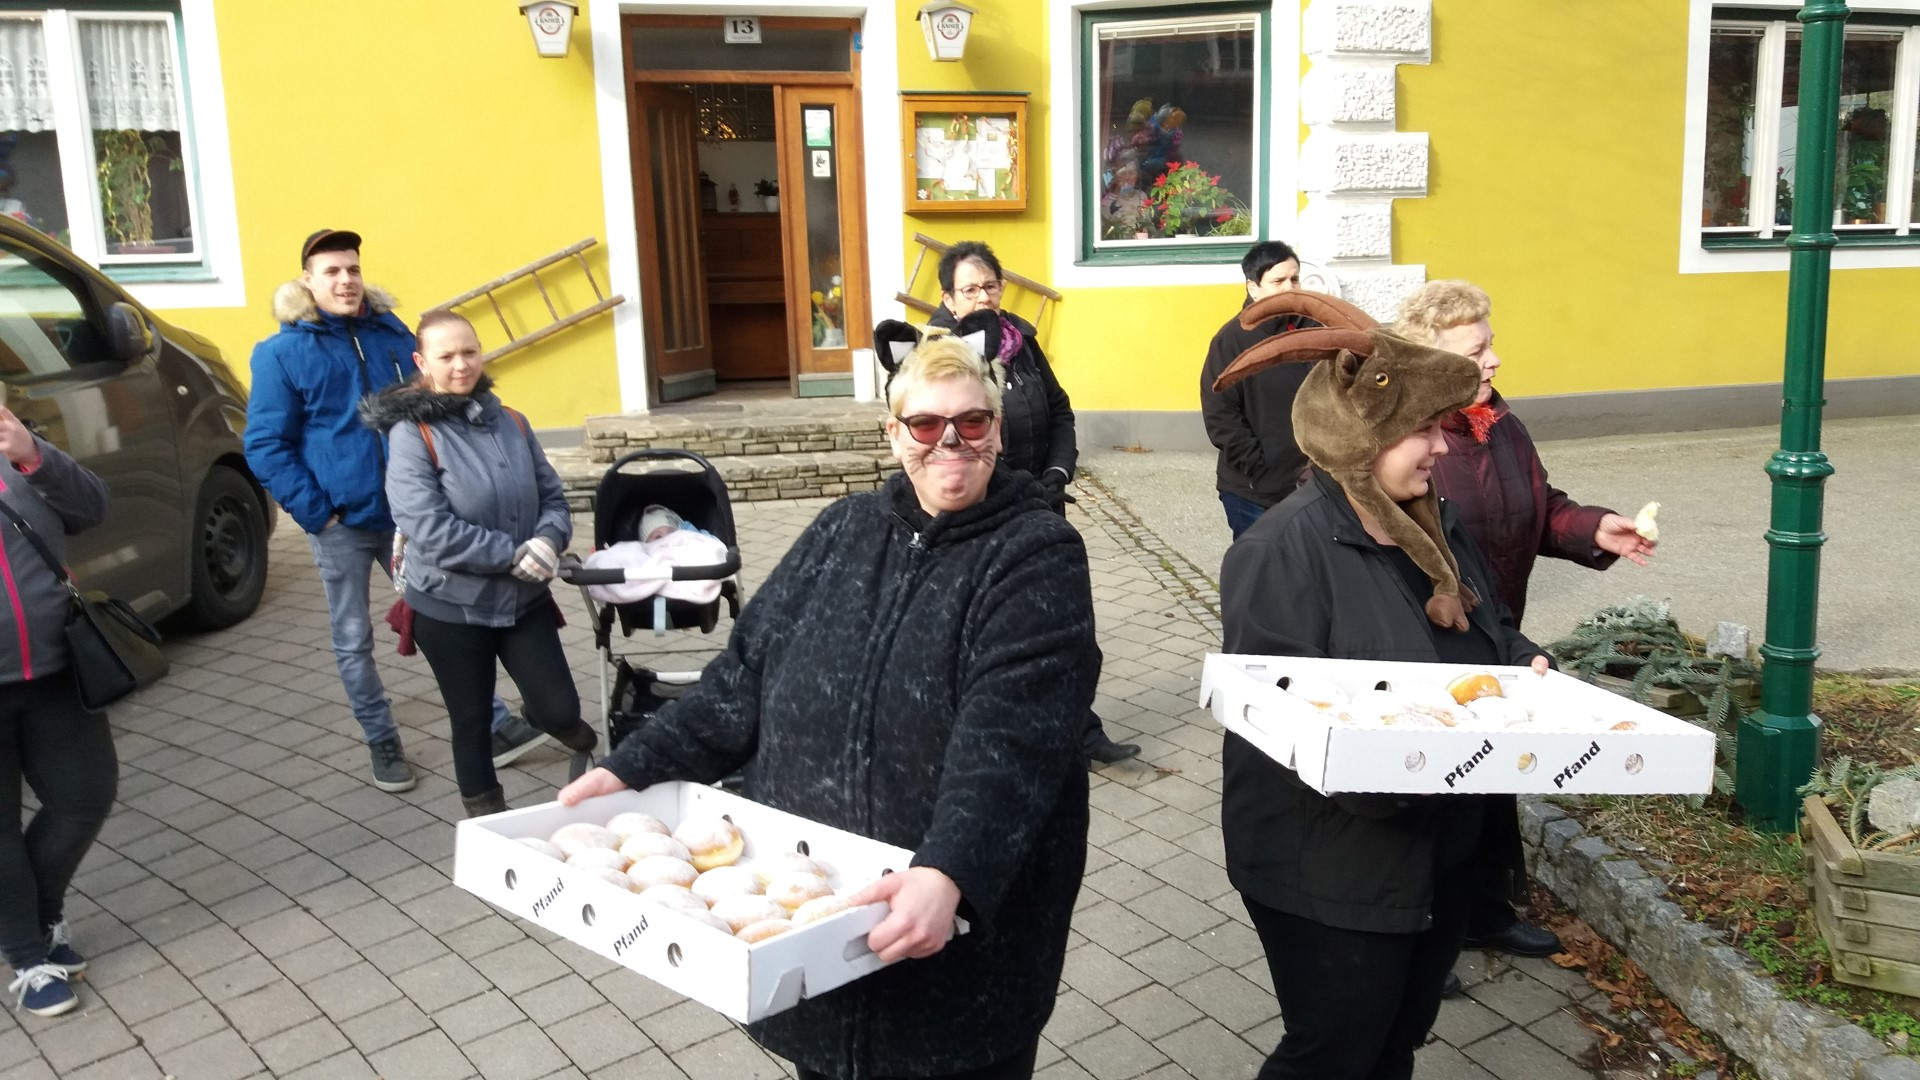 2018.02.13 Faschingsumzug Persenbeug (16) (Large)